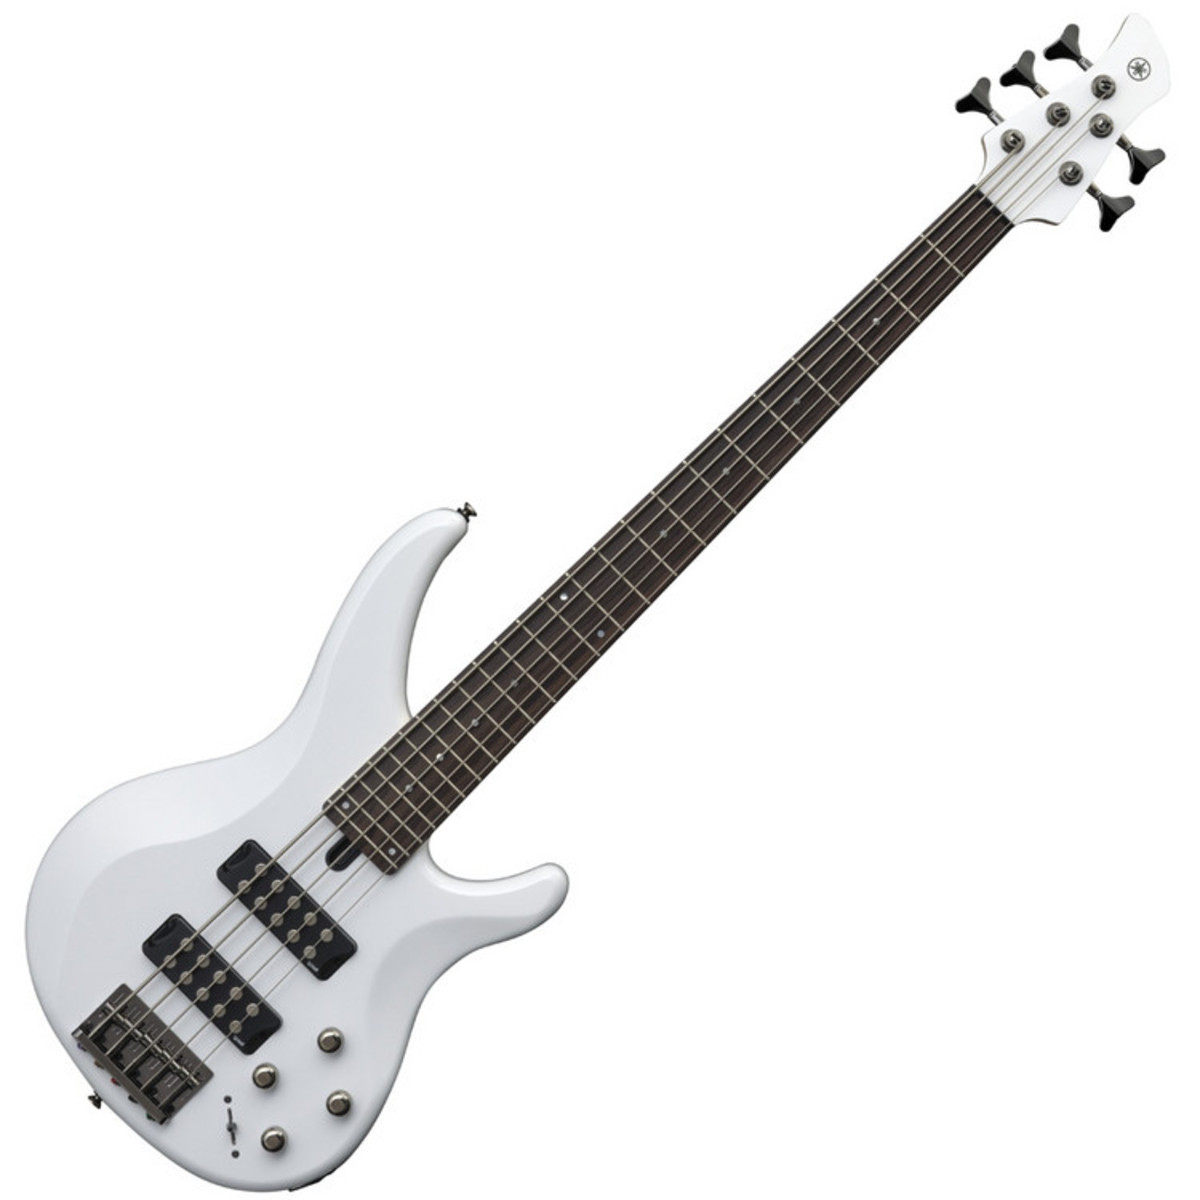 yamaha trbx305 5 cordes guitare basse blanc. Black Bedroom Furniture Sets. Home Design Ideas